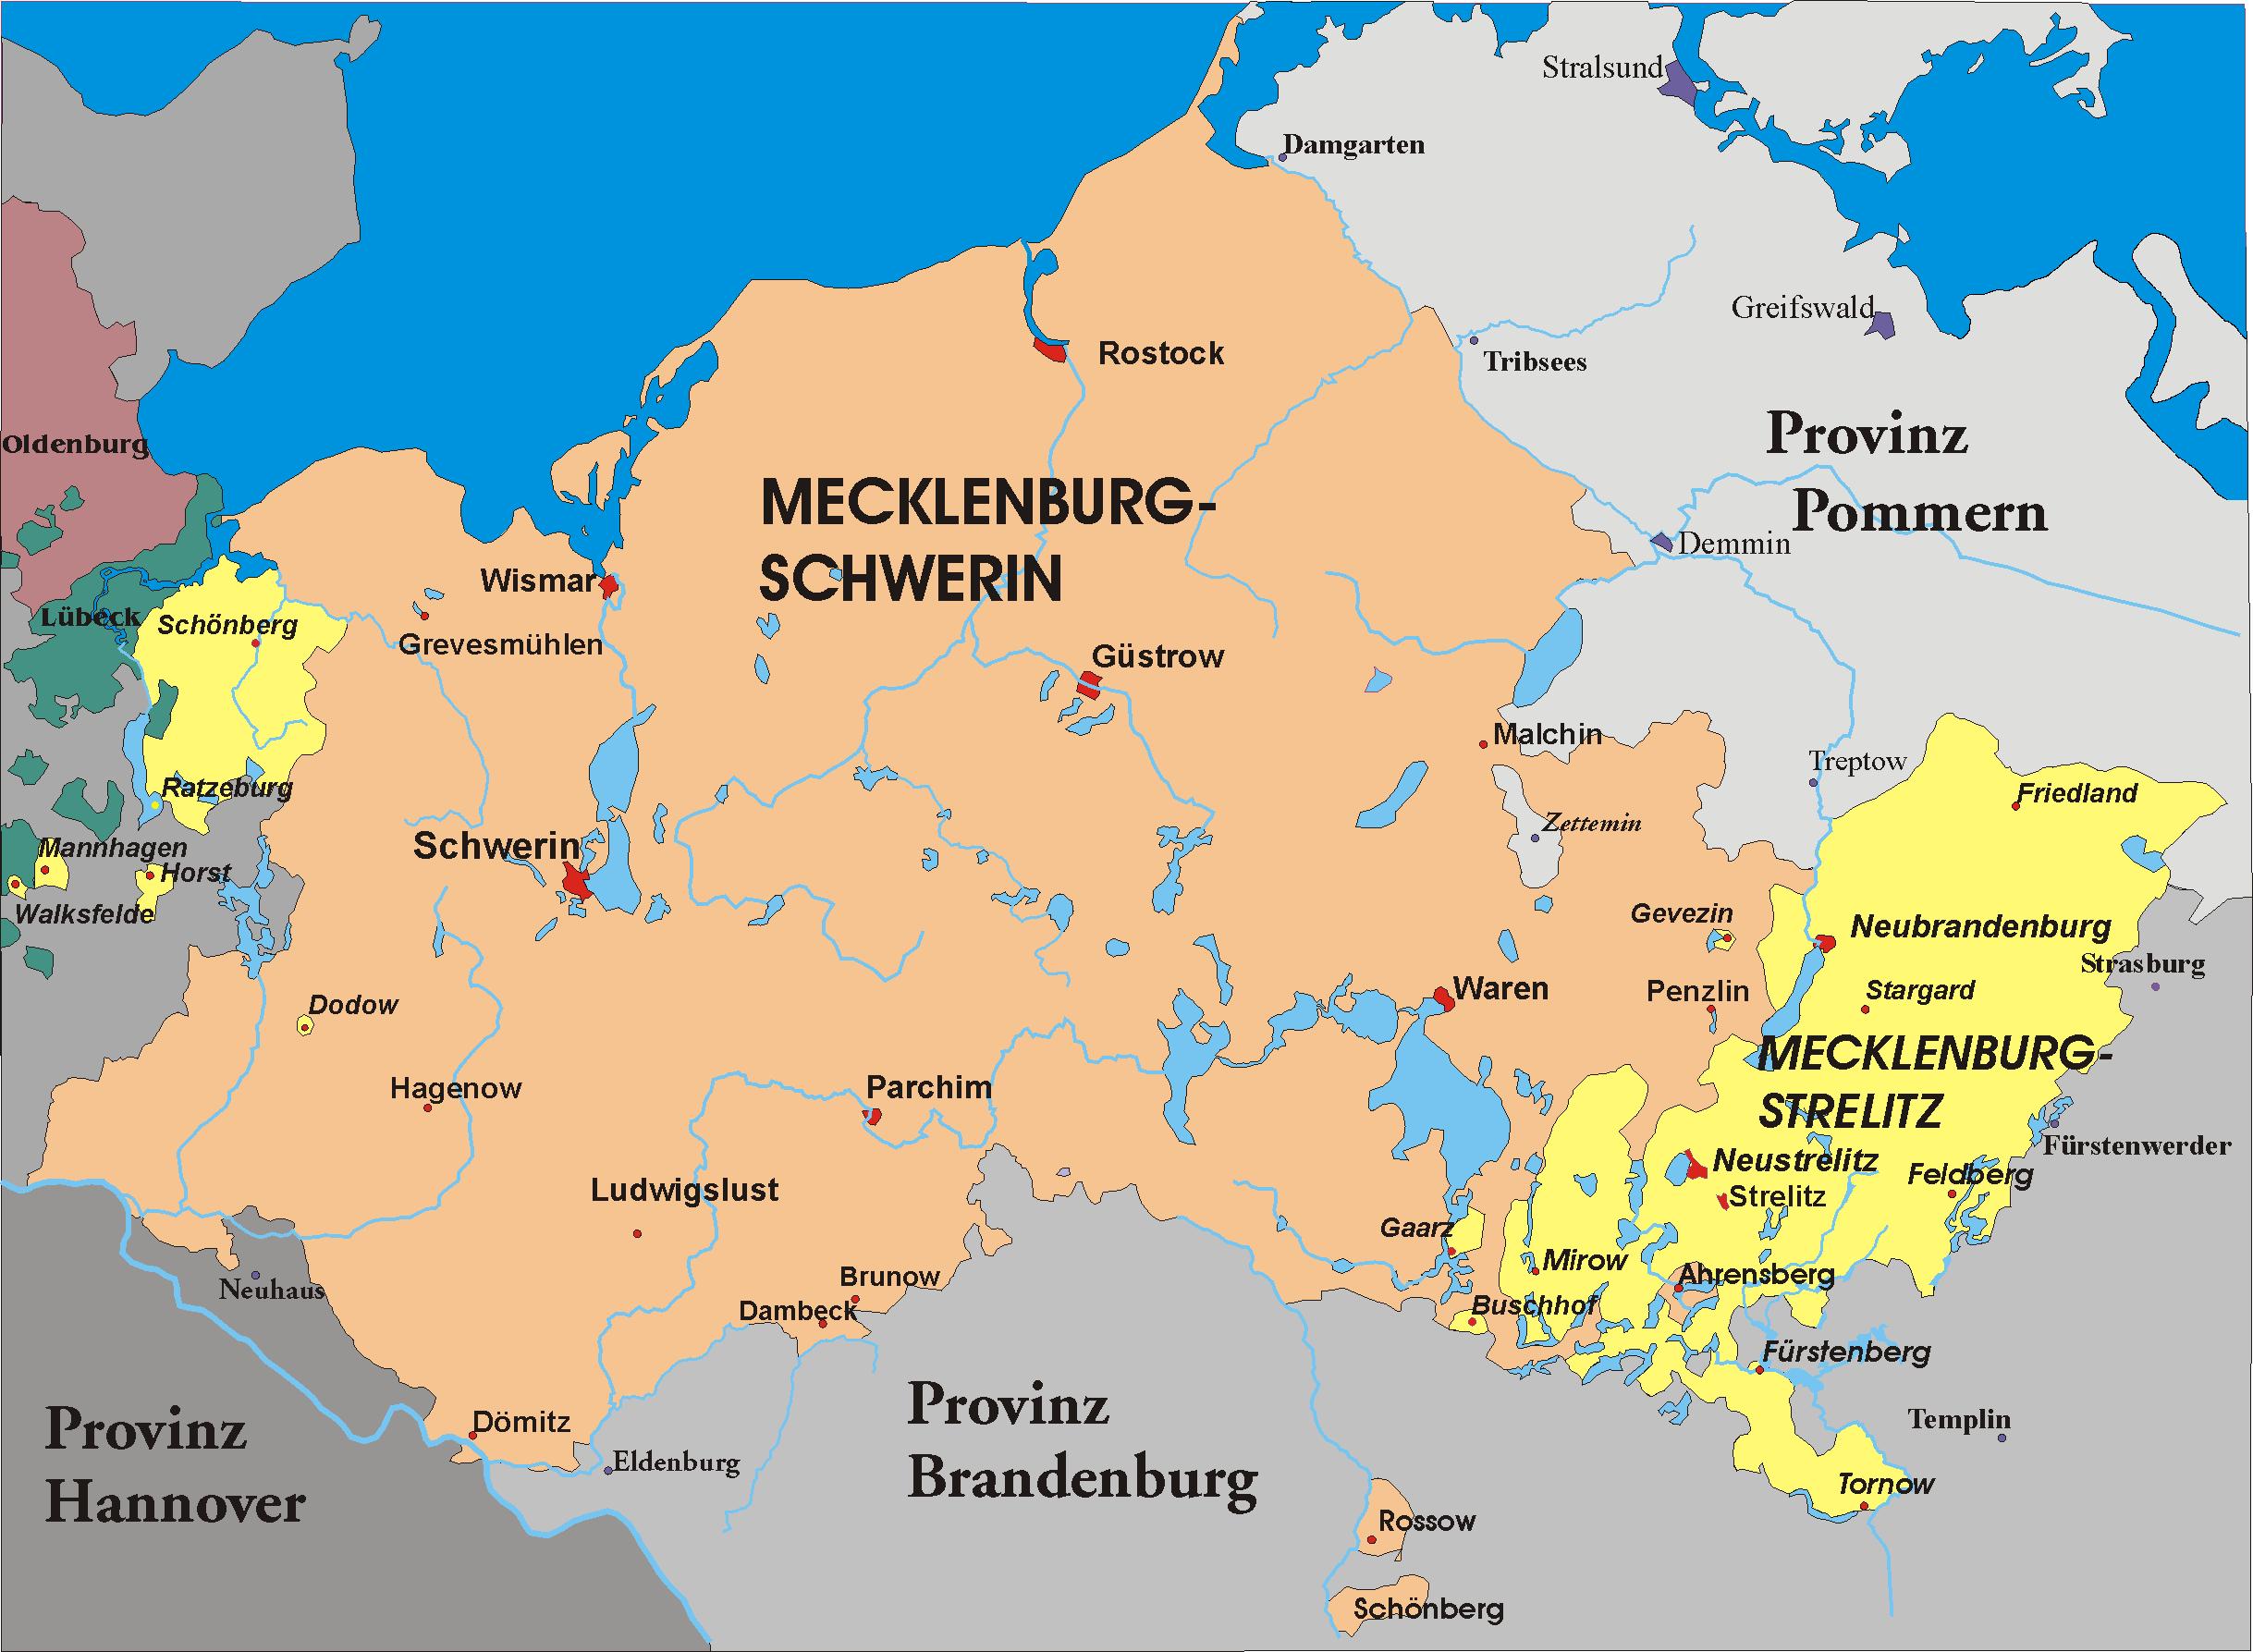 MecklenburgStrelitz MecklenburgVorpommern Germany Prussia